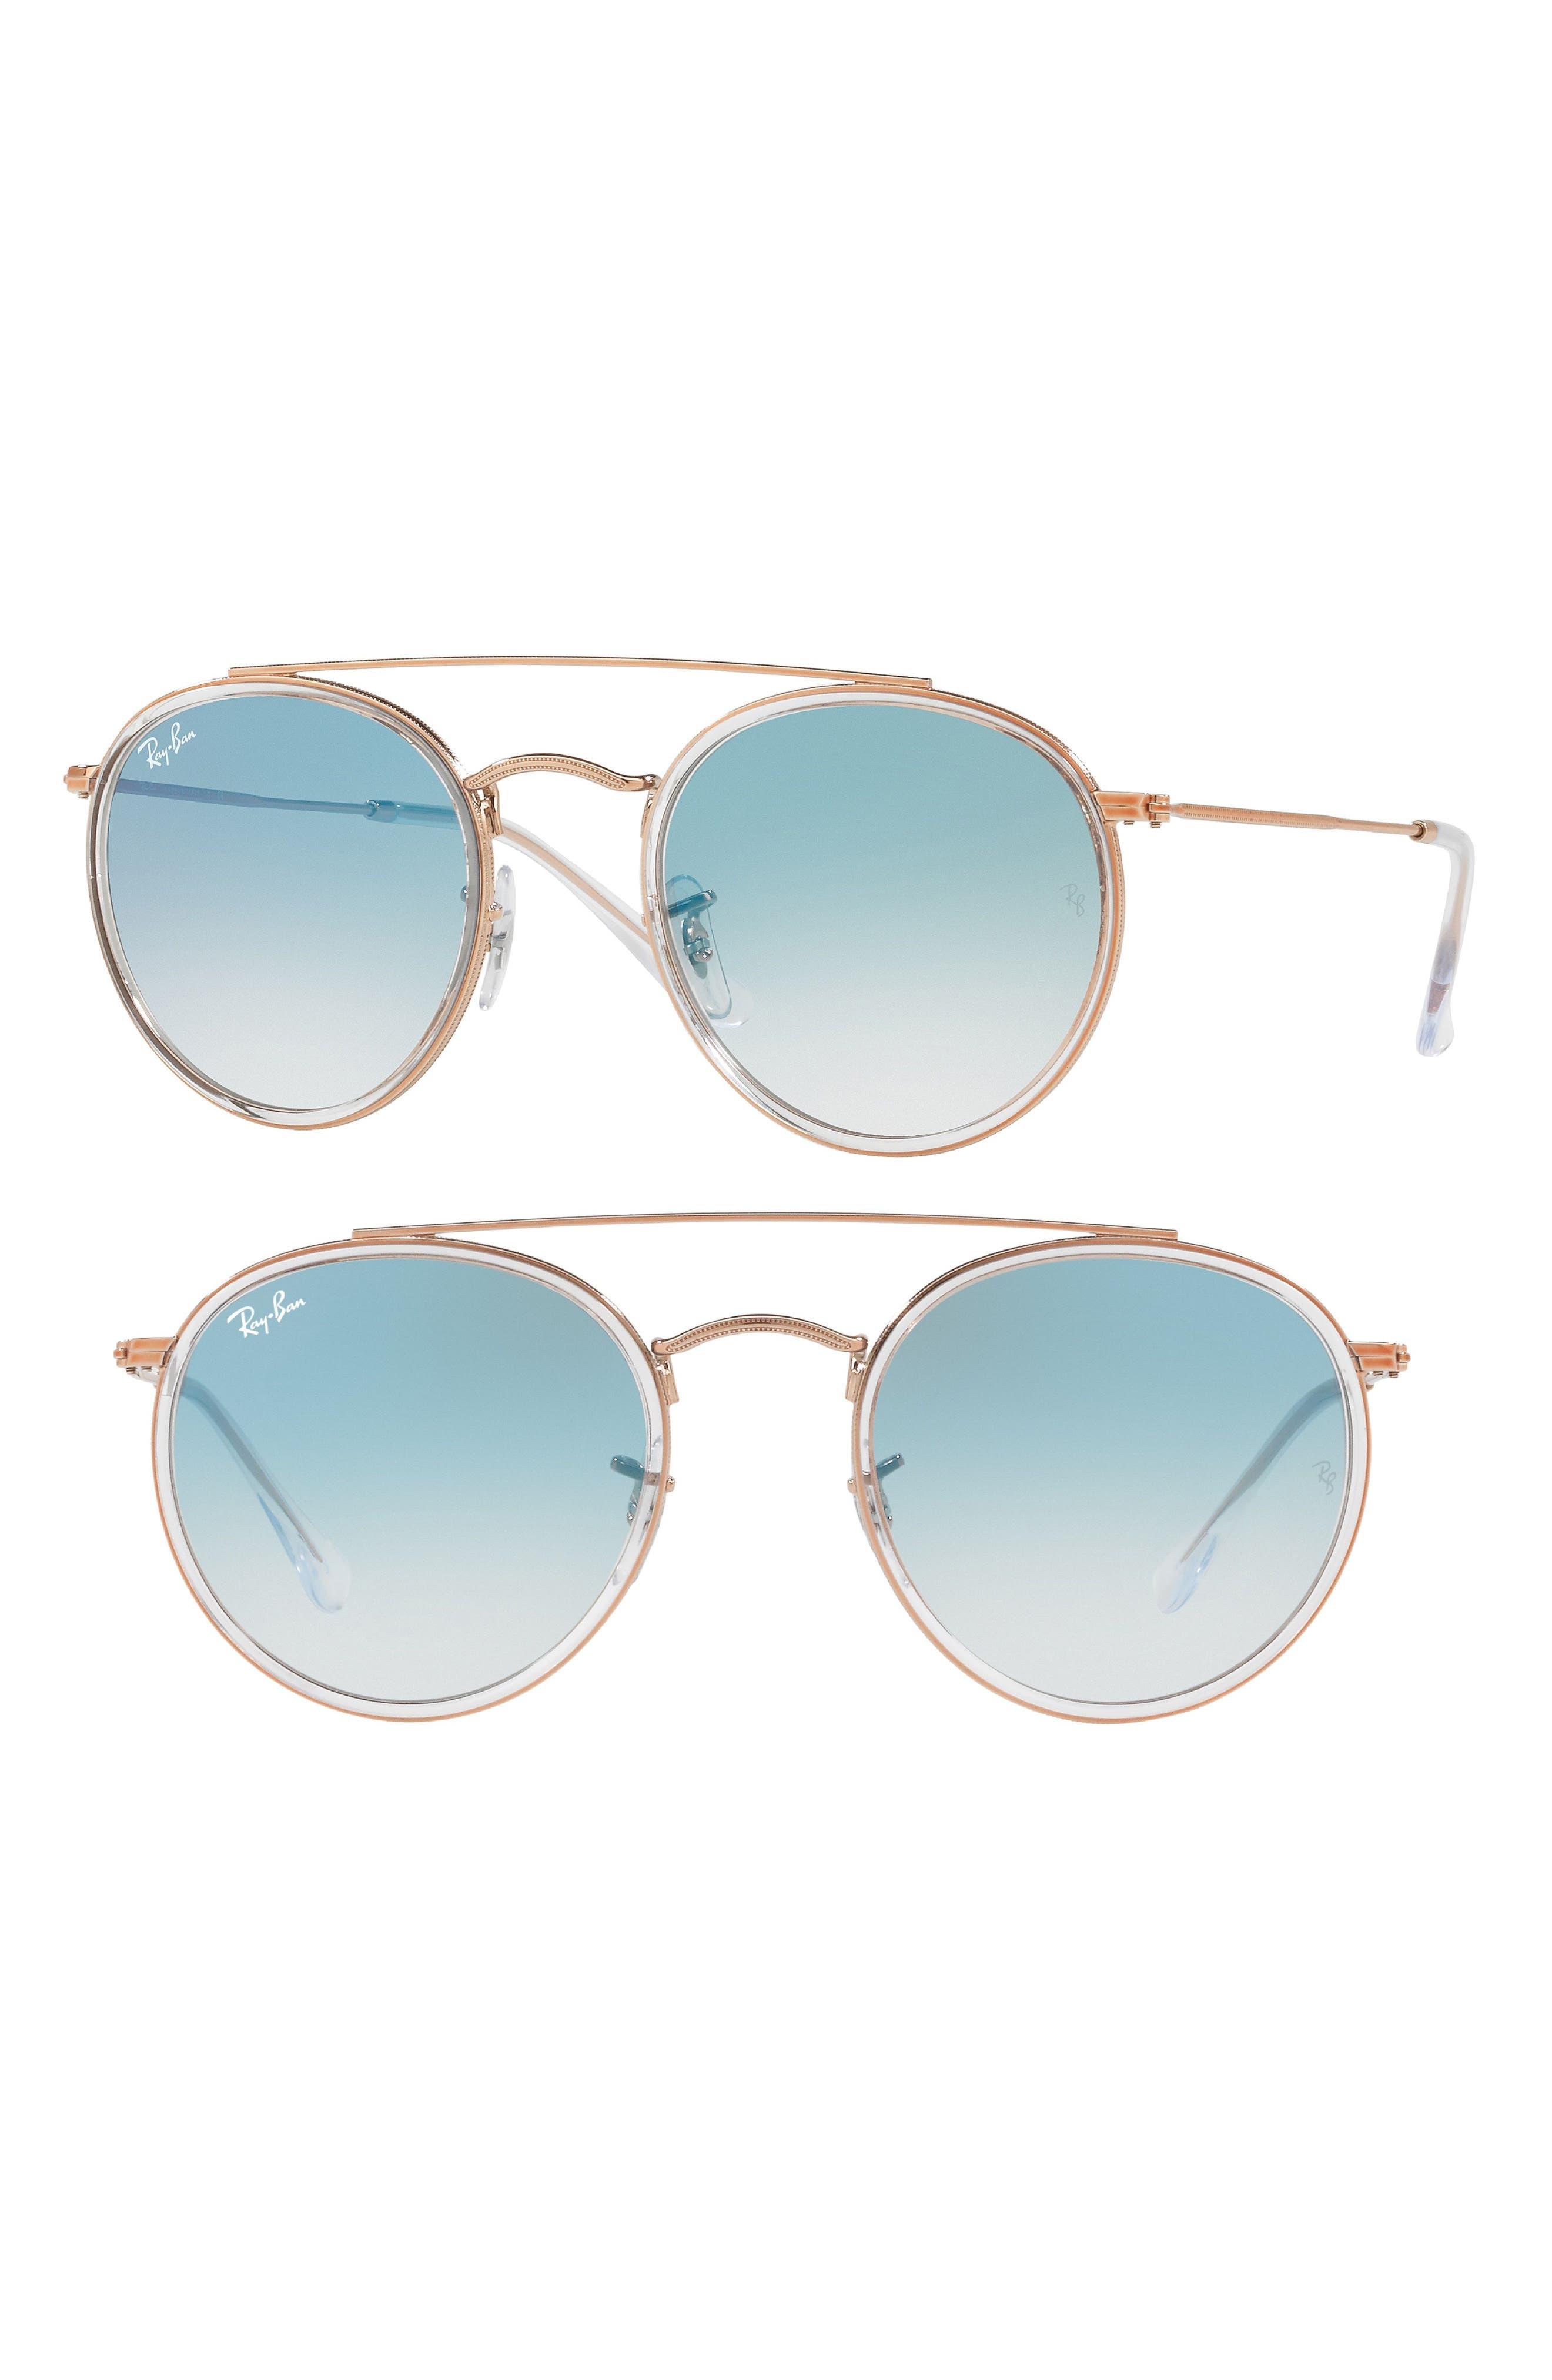 RAY-BAN, 51mm Aviator Gradient Lens Sunglasses, Main thumbnail 1, color, BLUE TRANSPARENT